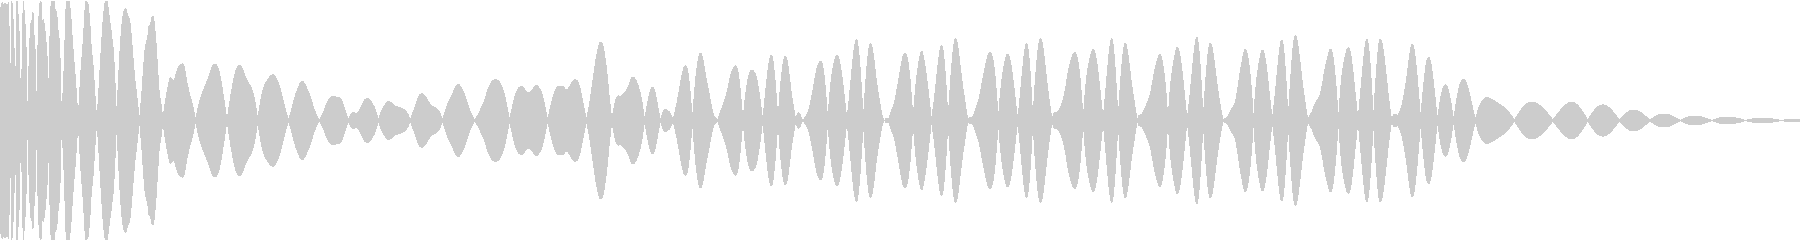 EDMキック キーDの未再生の波形